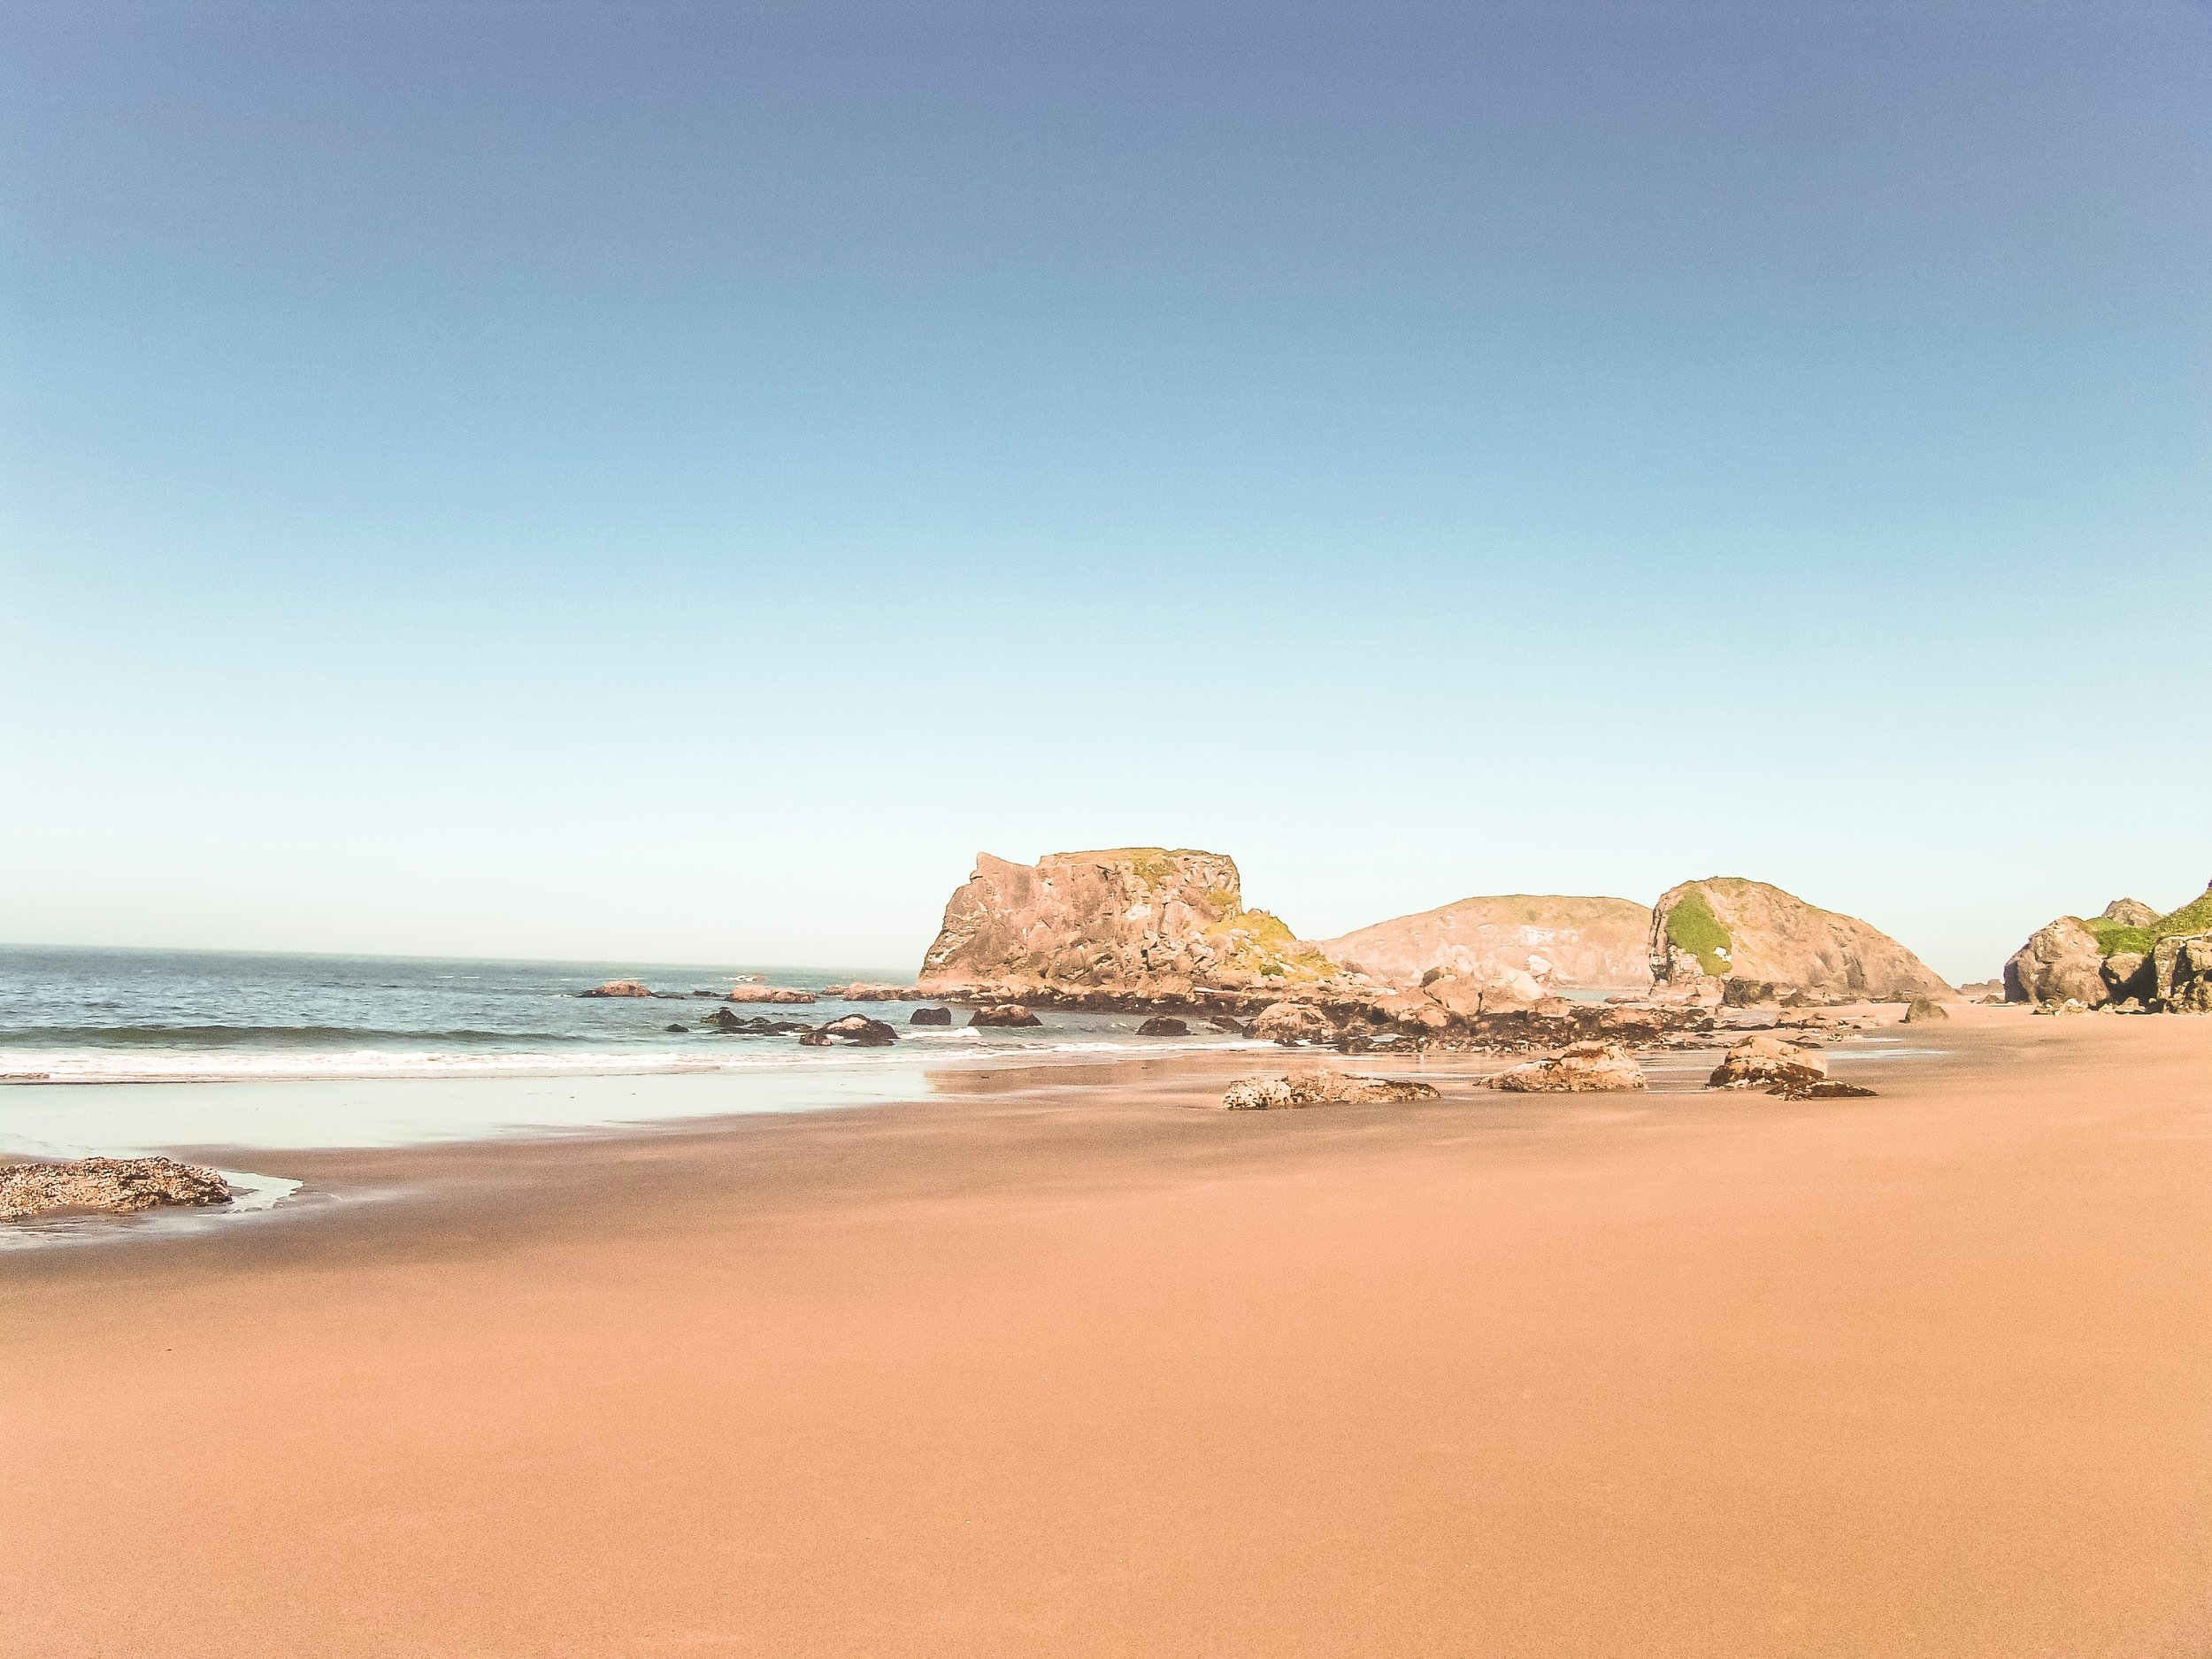 beach-ocean-sand-340.jpg